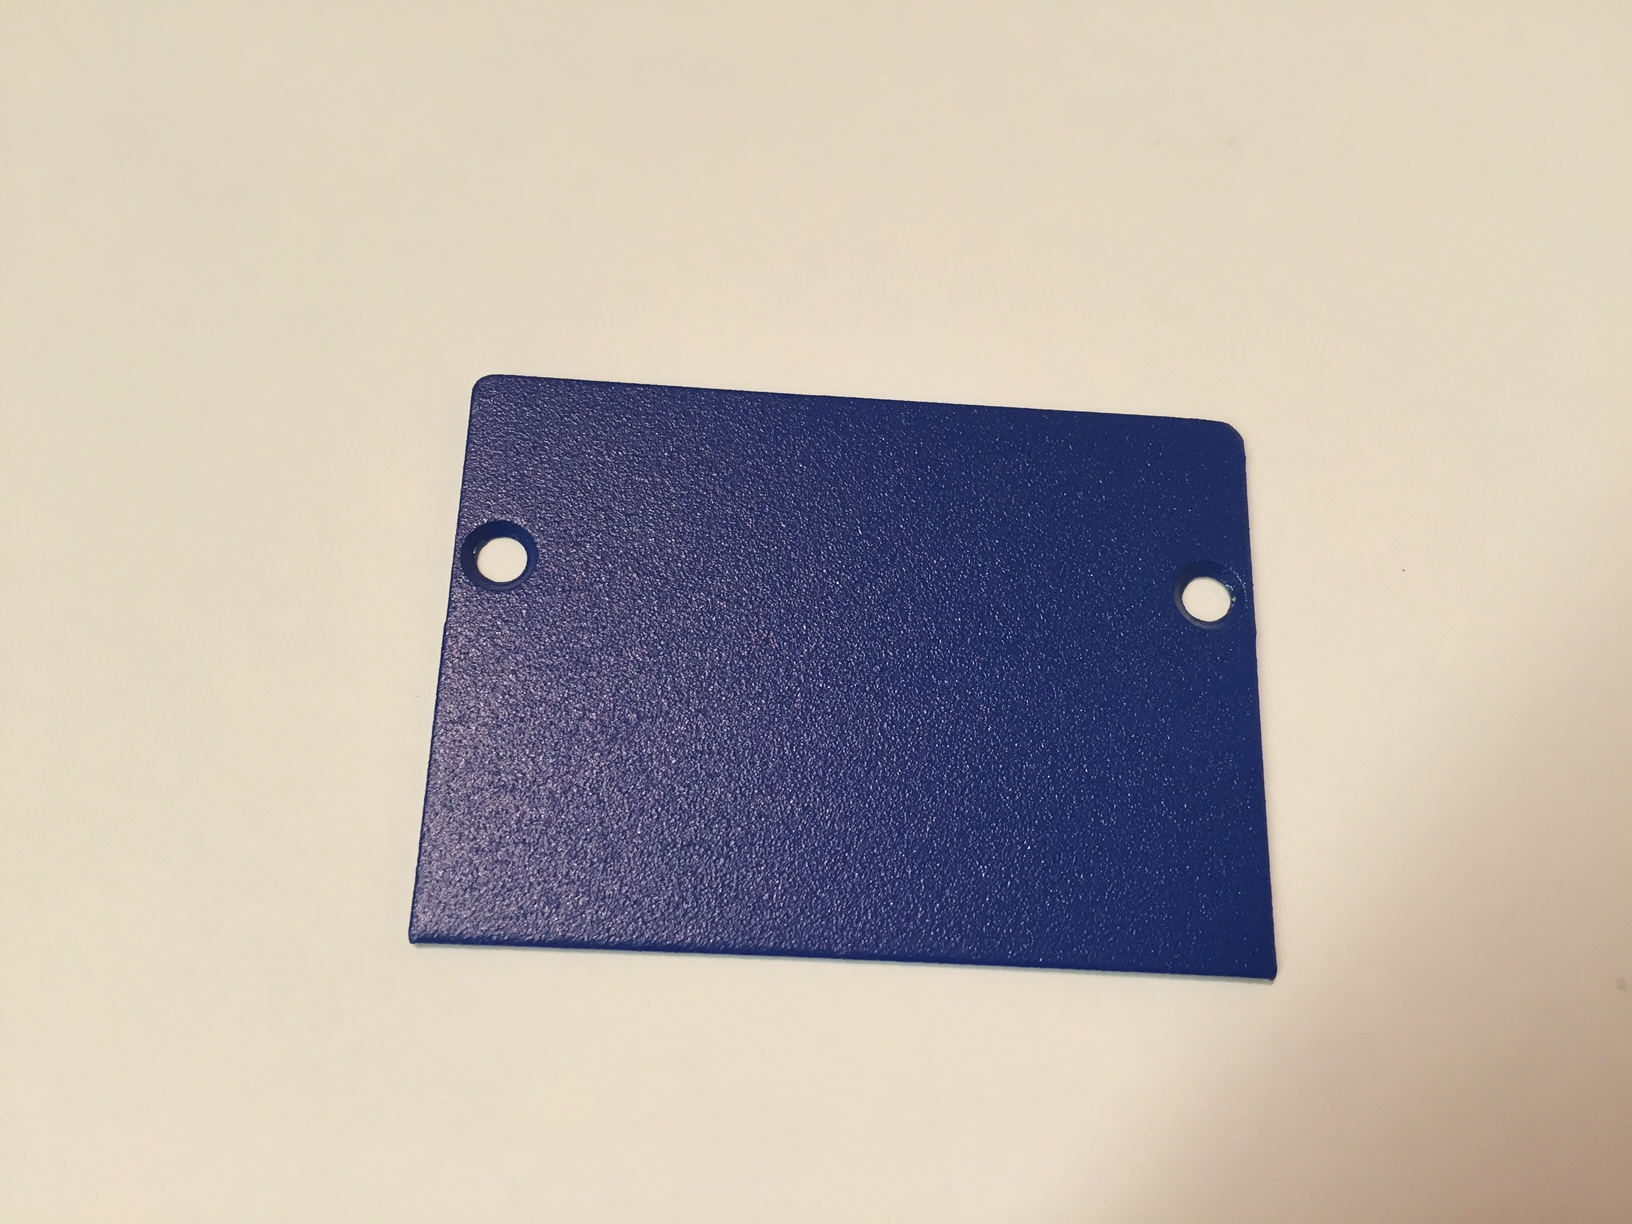 duinoCase-RP-BLANK-METAL-BLUE